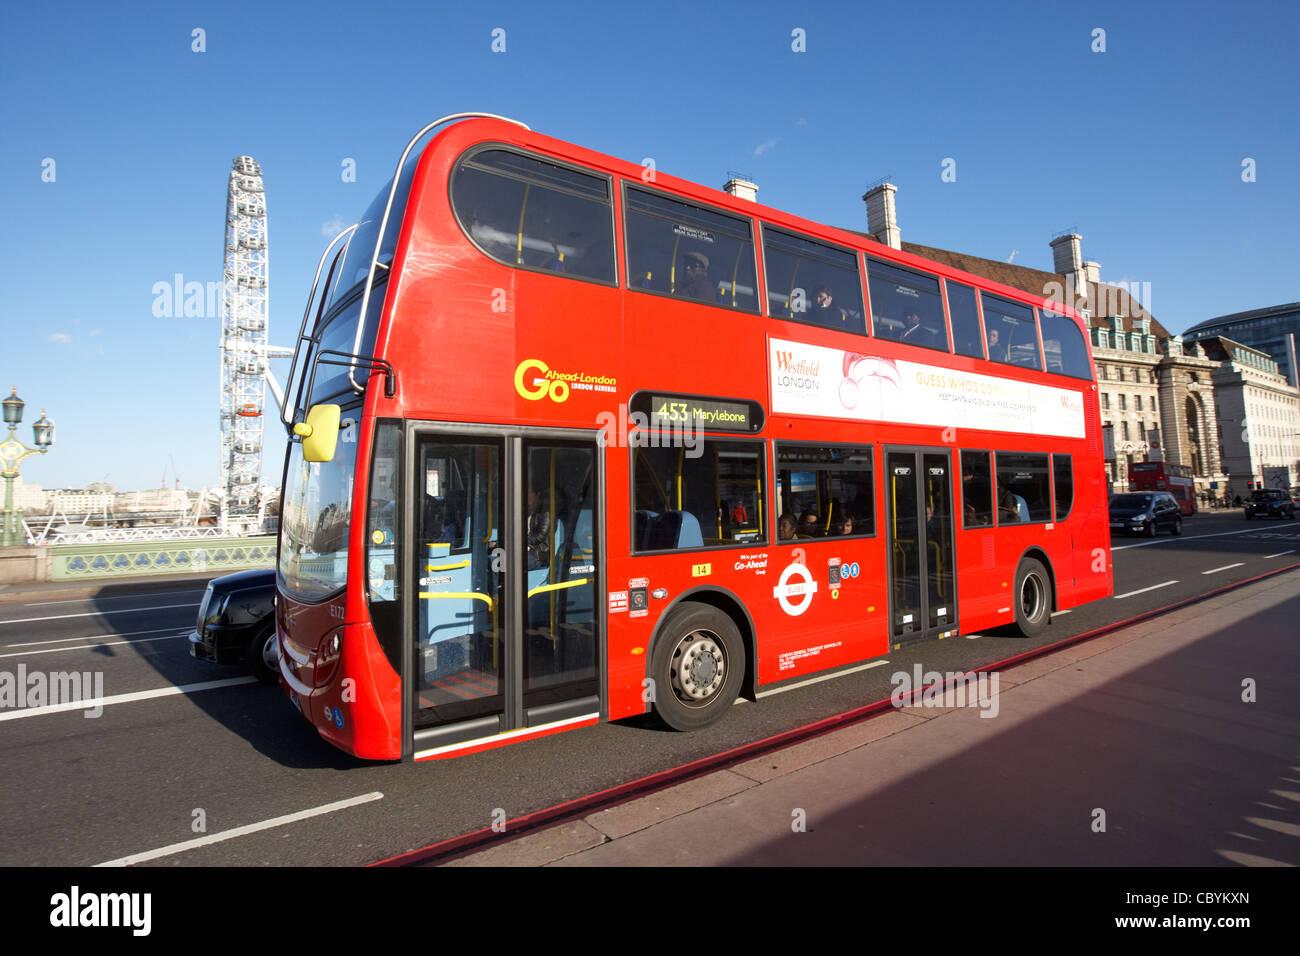 london red double decker bus public transport crossing westminster bridge england united kingdom uk - Stock Image